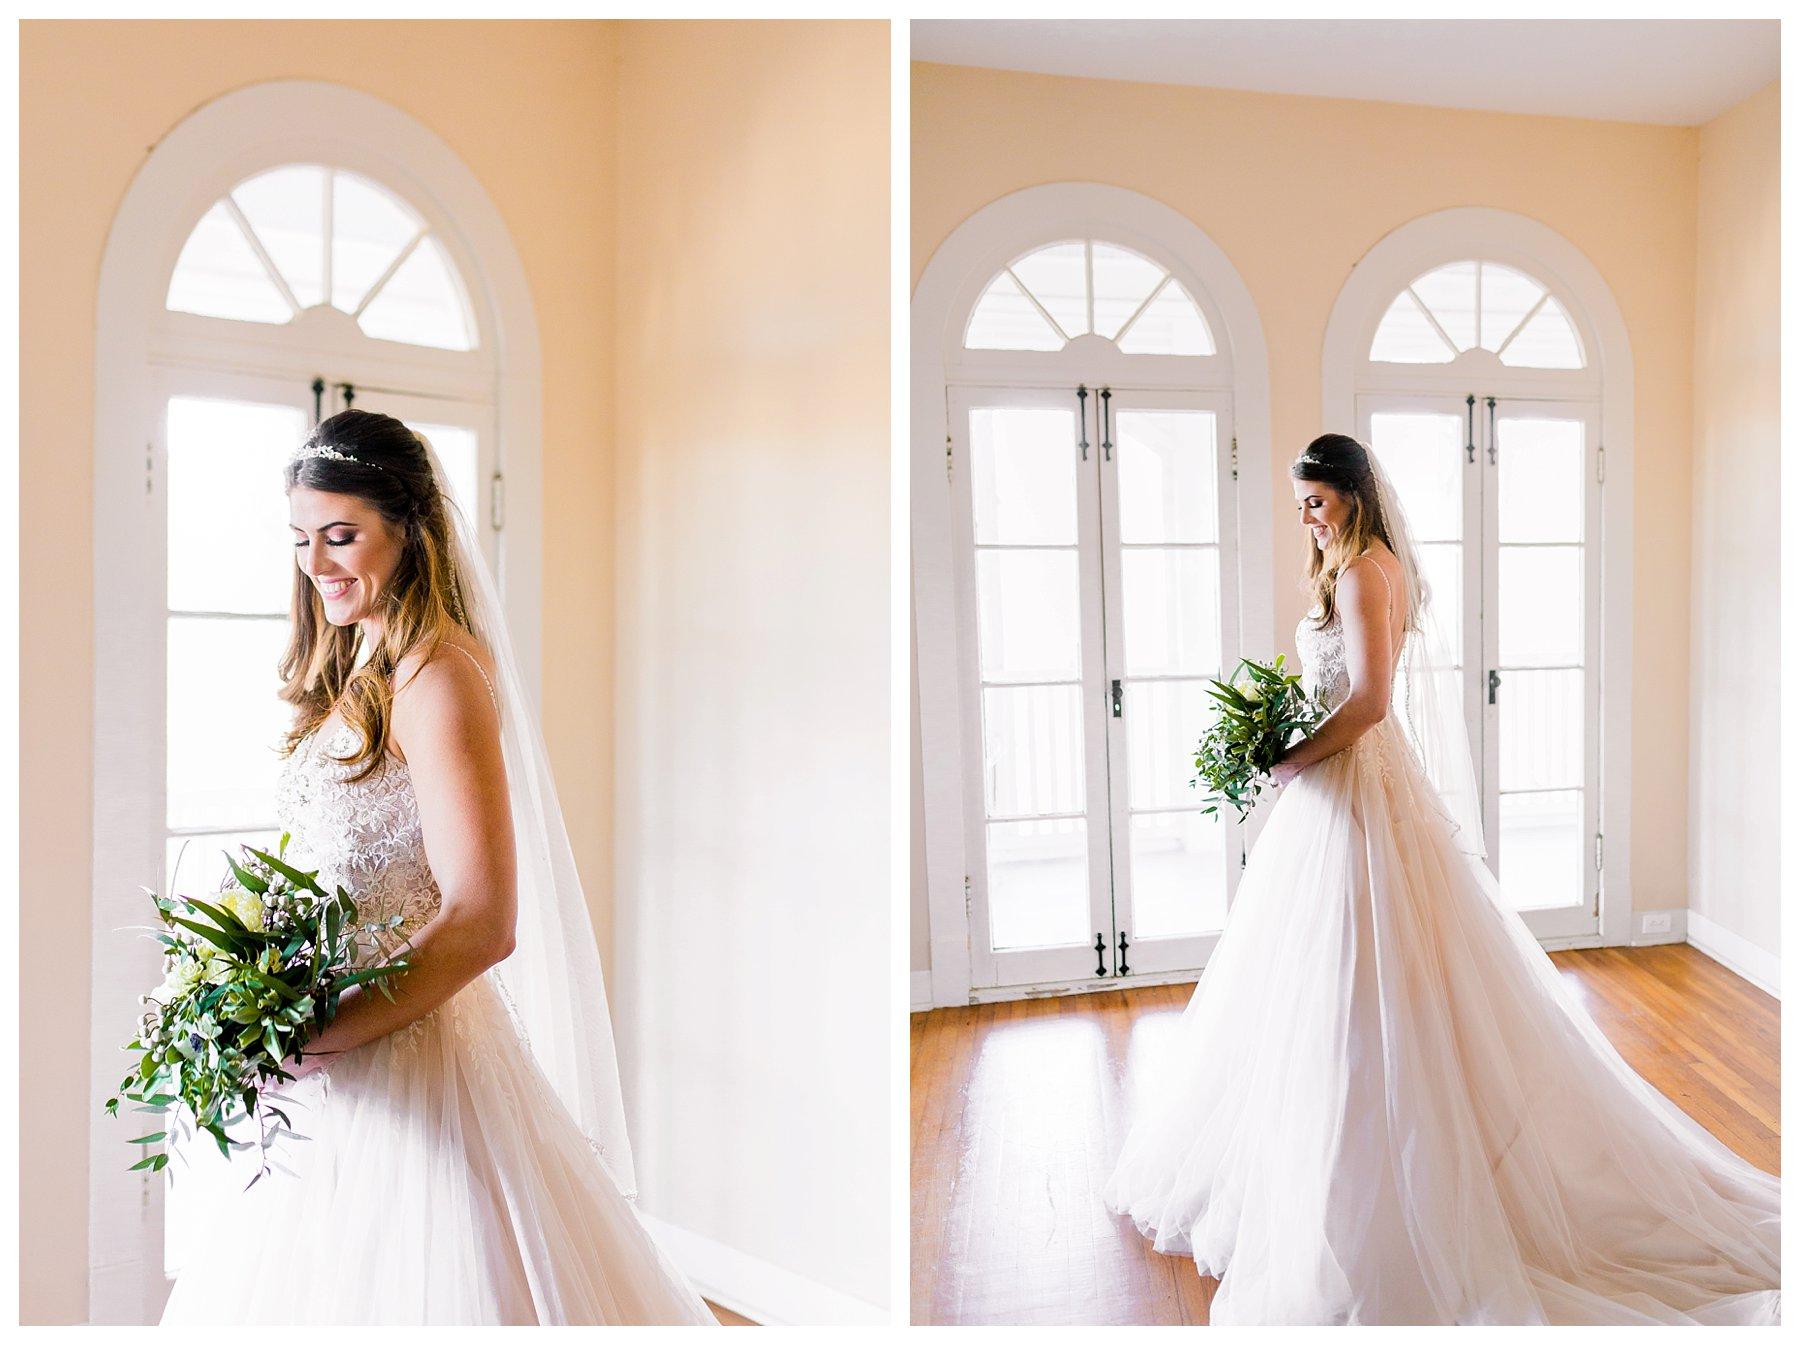 photographer_wedding_saint_louis_Kansas_City_Photography_Videography_workshop_training_styled_engagement_Lake_Ozark_KC_MO_STL_Rolla_Hermann_Saint_James_0394.jpg